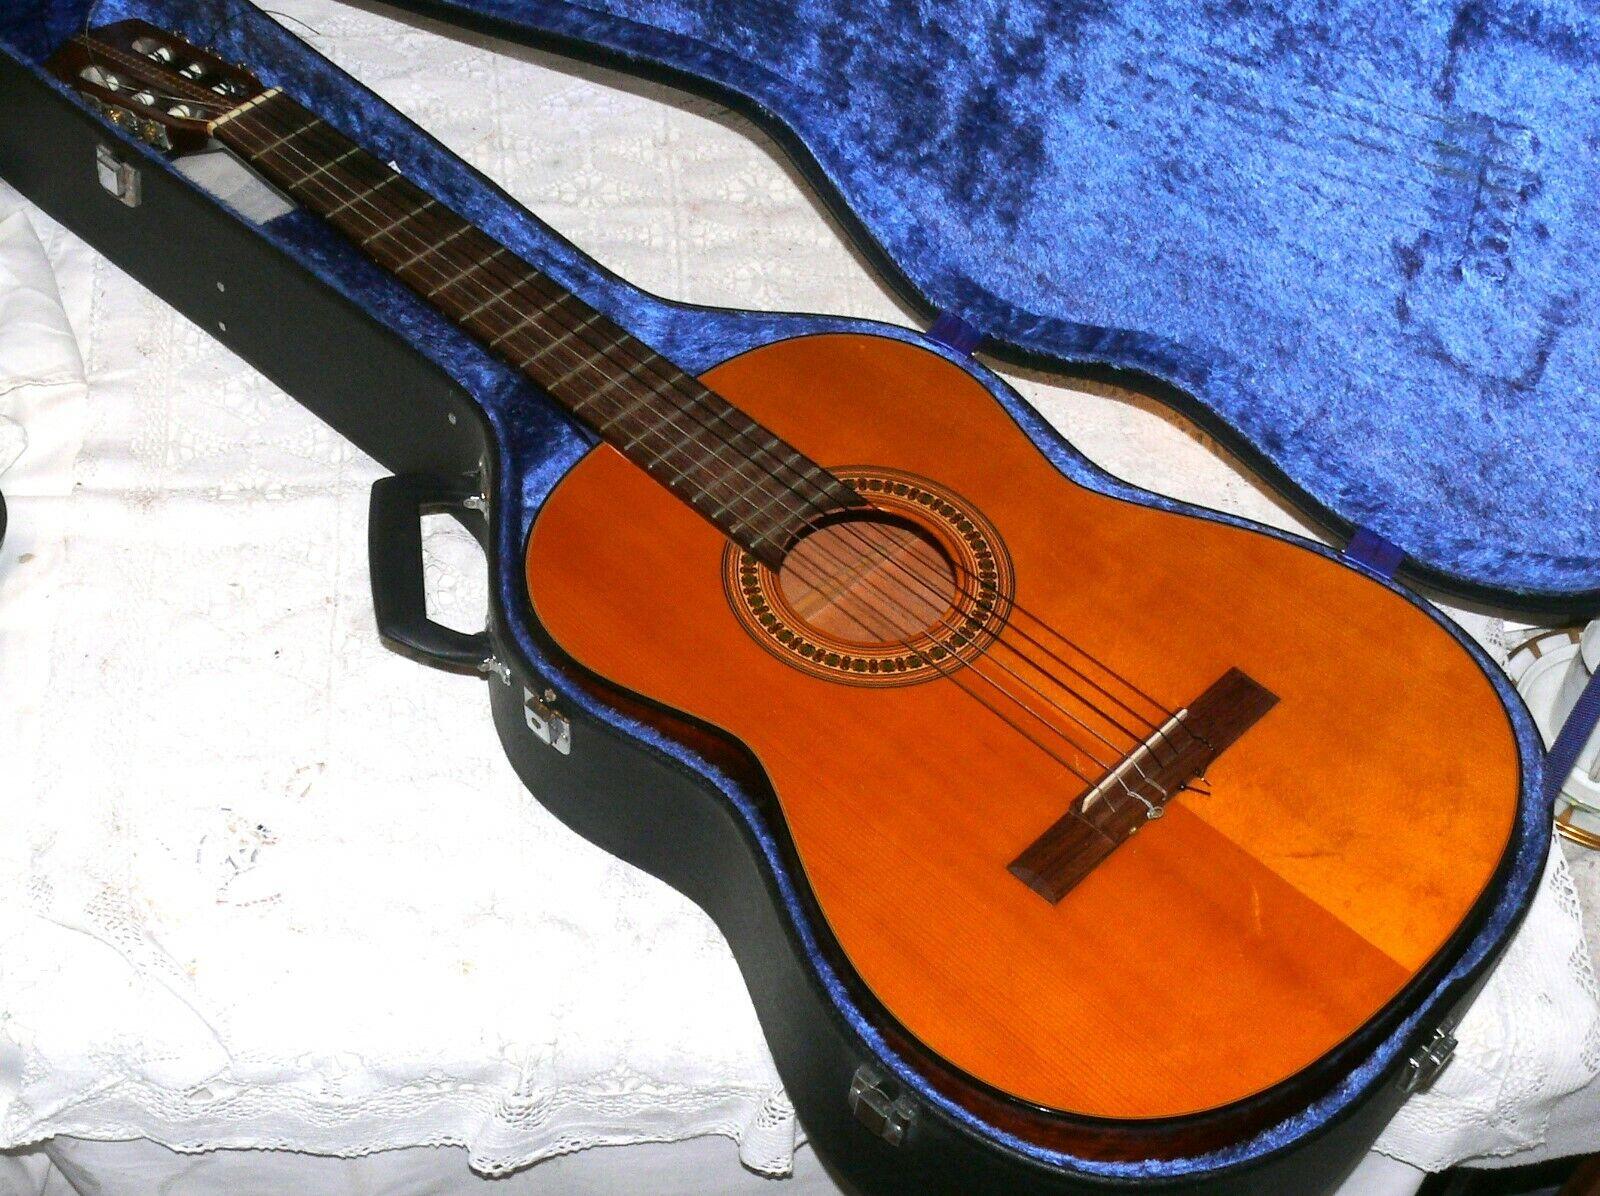 Otto Gläsel Vintage Klassik Akustik-Gitarre Meister Konzertgitarre Koffer 14512